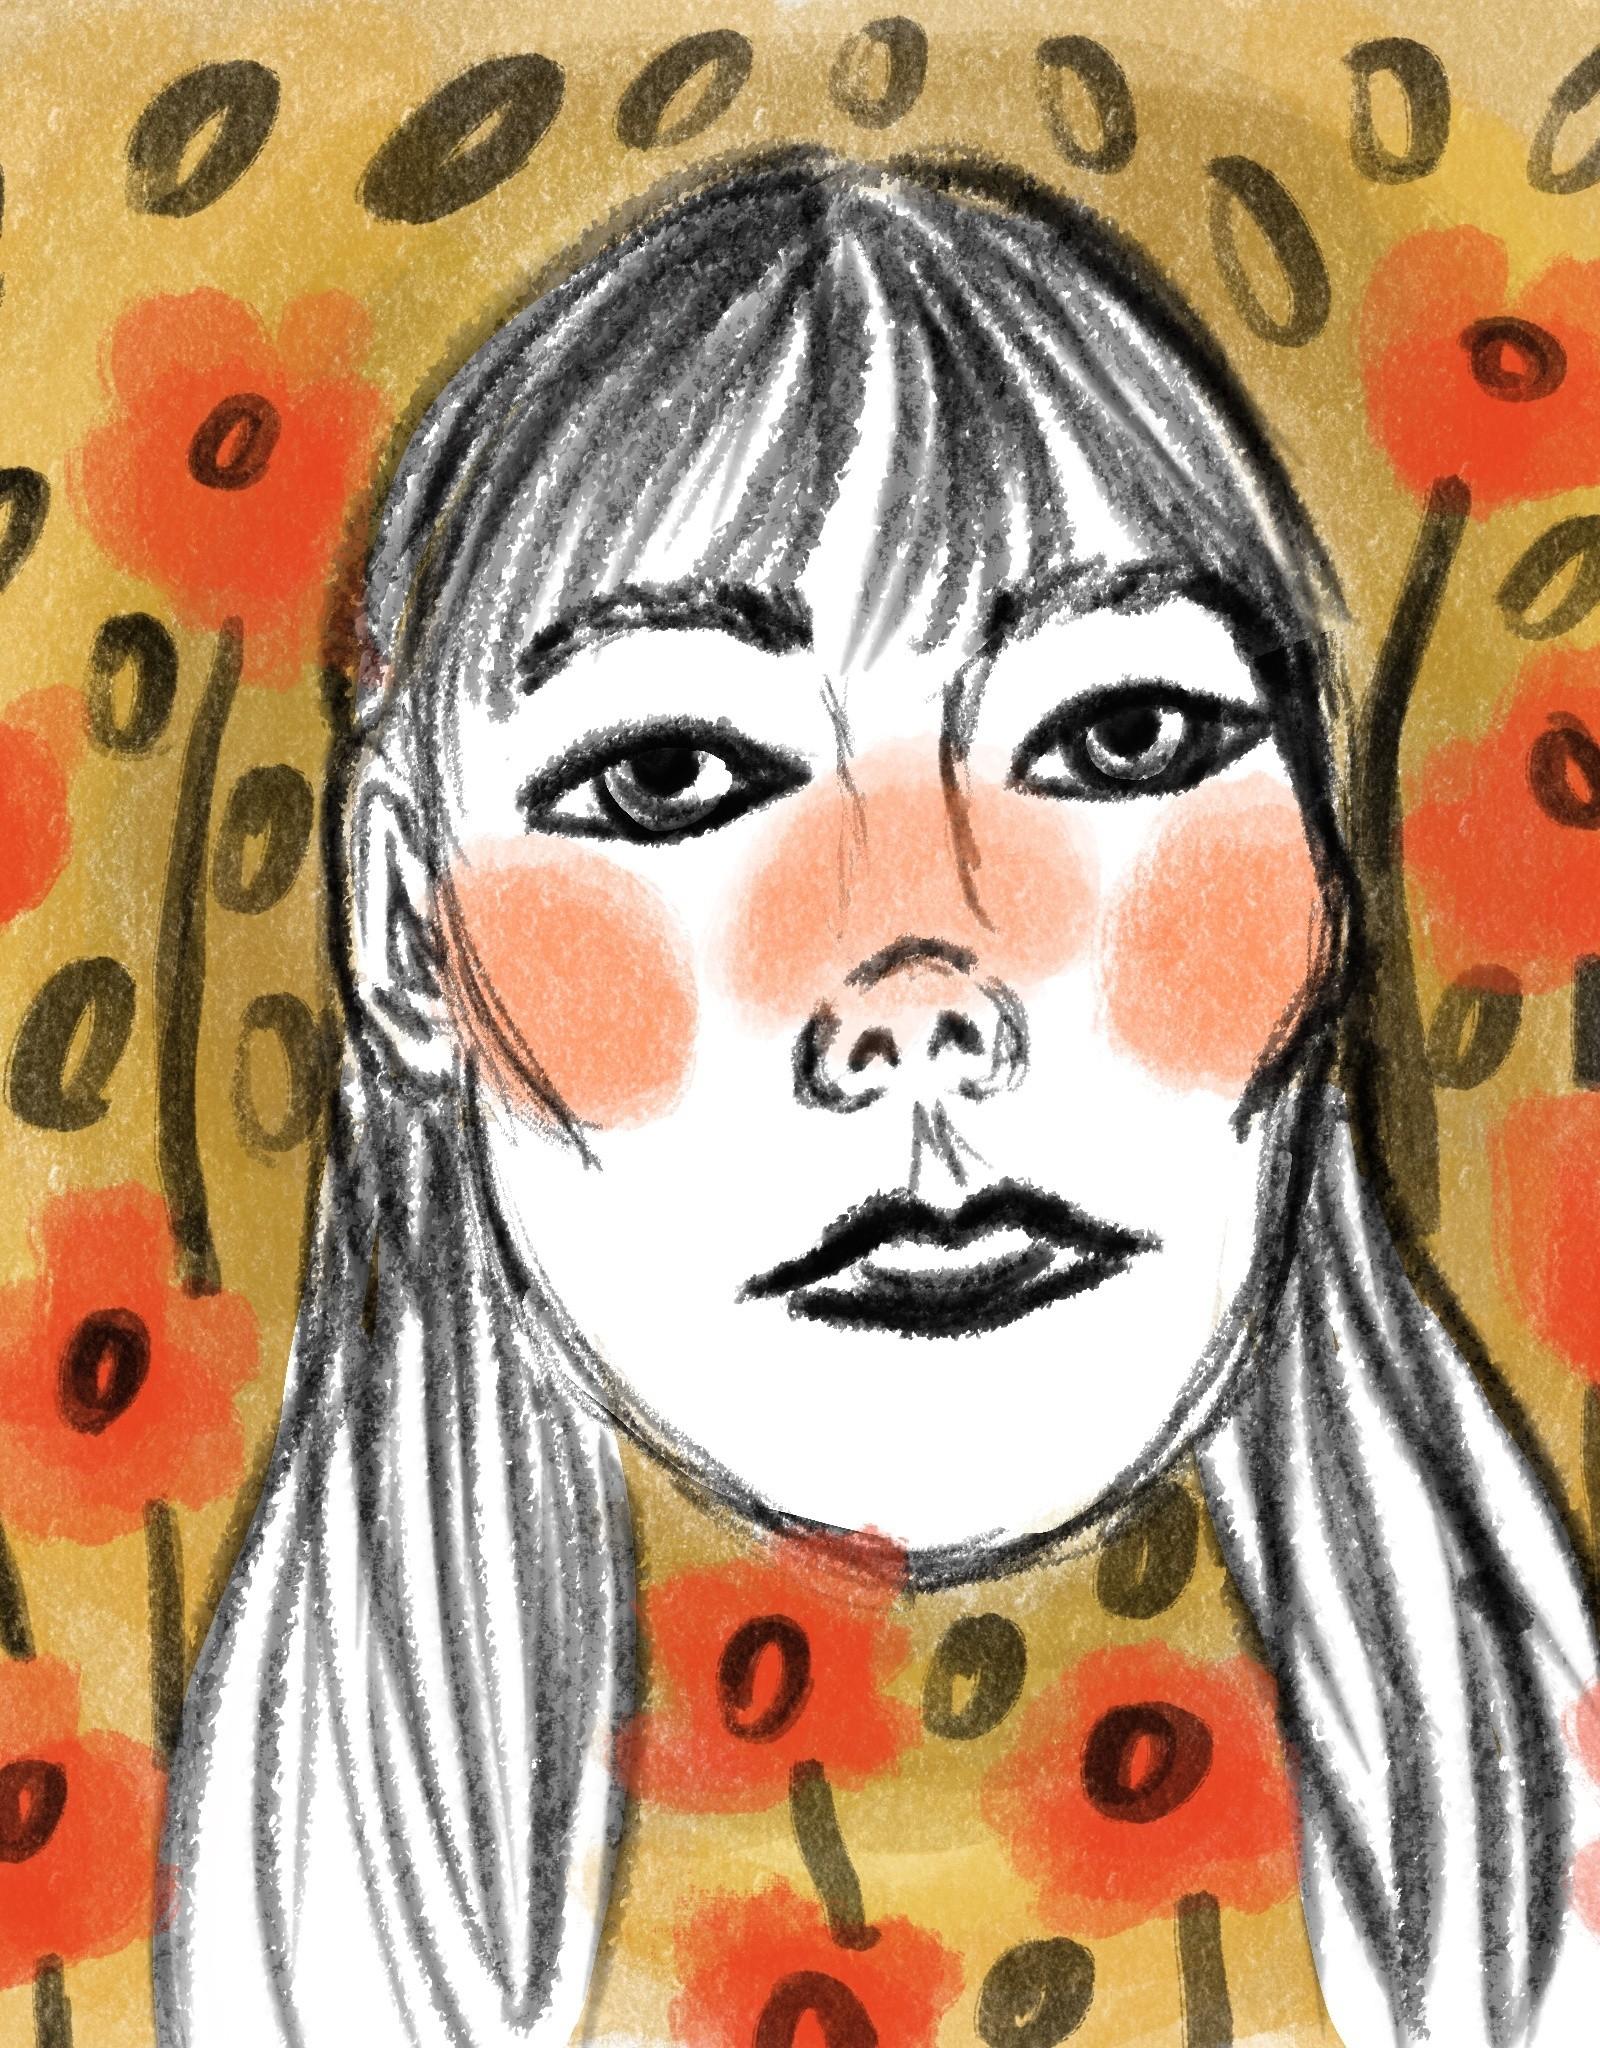 Commission Portrait by Lizzie Monsreal